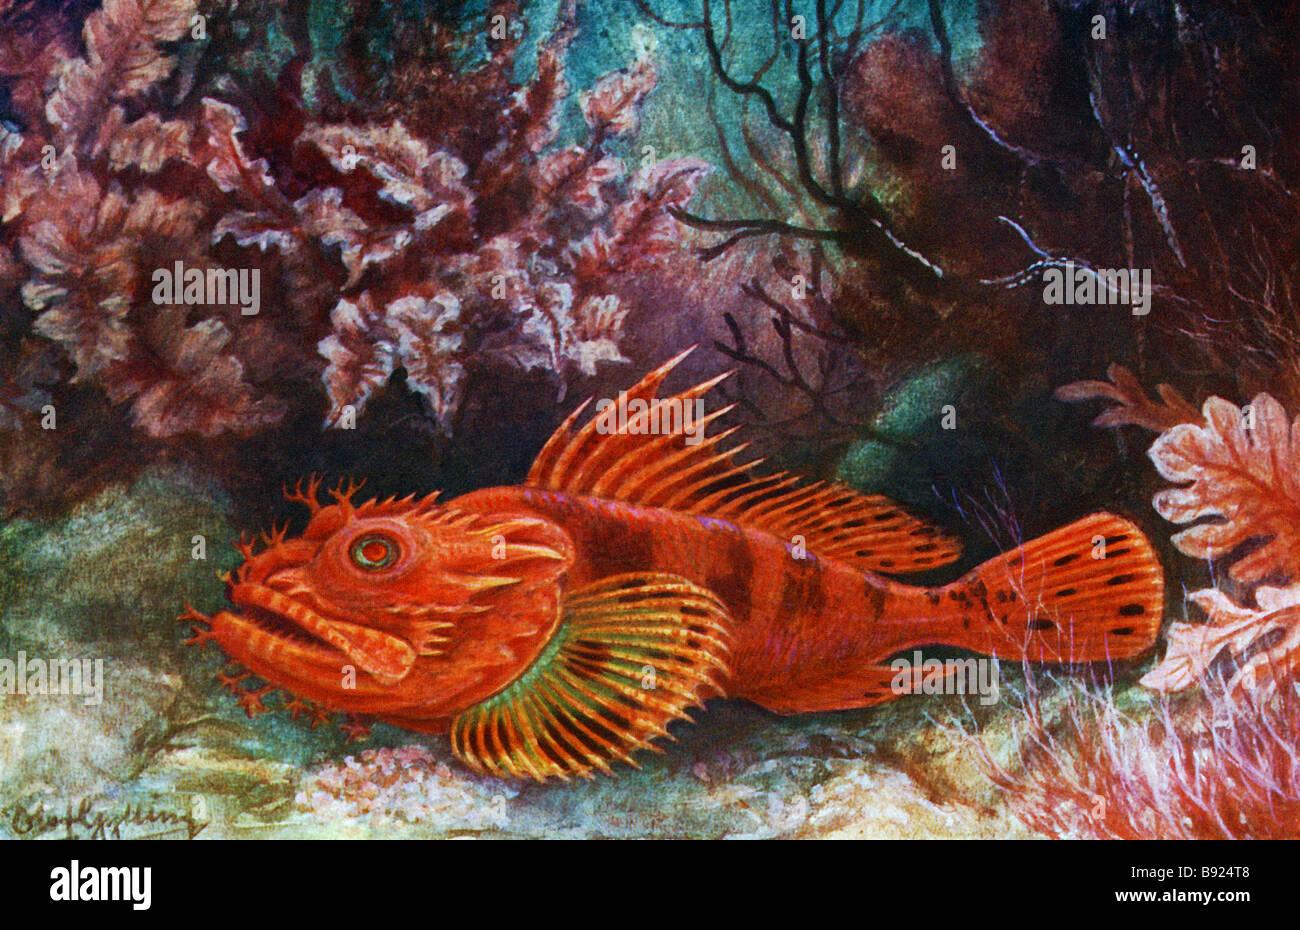 The Red Scorpion Fish, Scorpaena Scrofa, 19th century illustration by Olof Gylling (1850-1928) Stock Photo